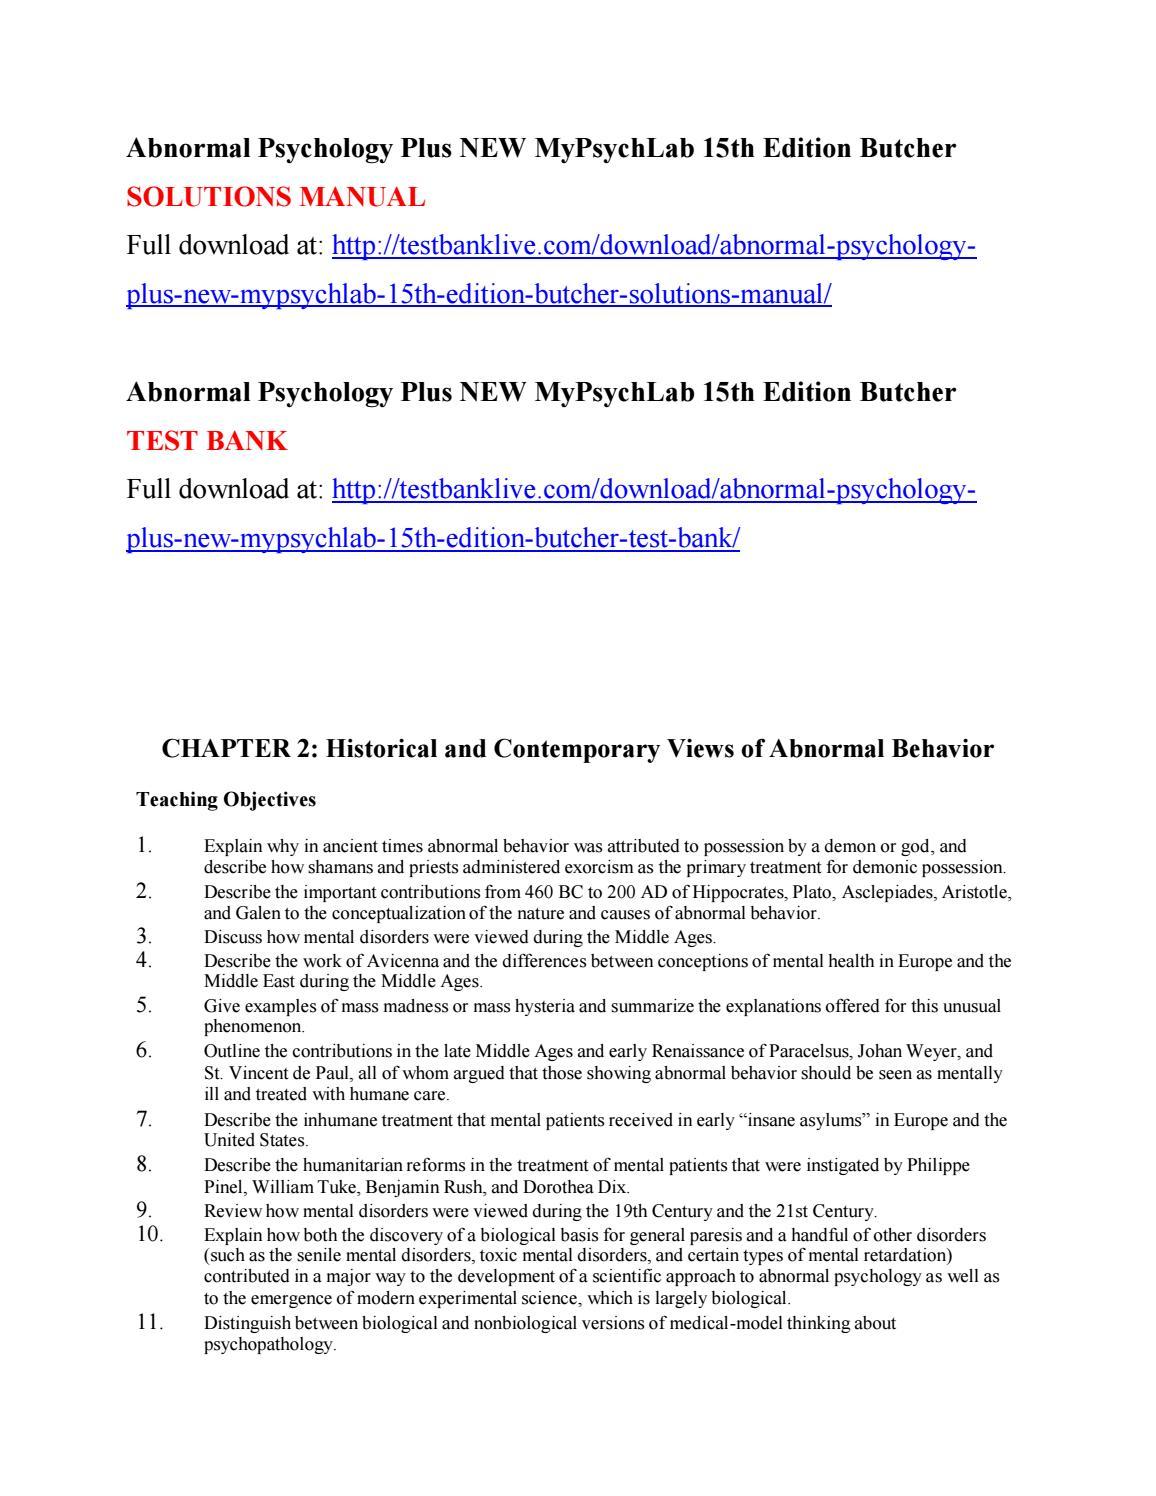 Abnormal psychology plus new mypsychlab 15th edition butcher ...